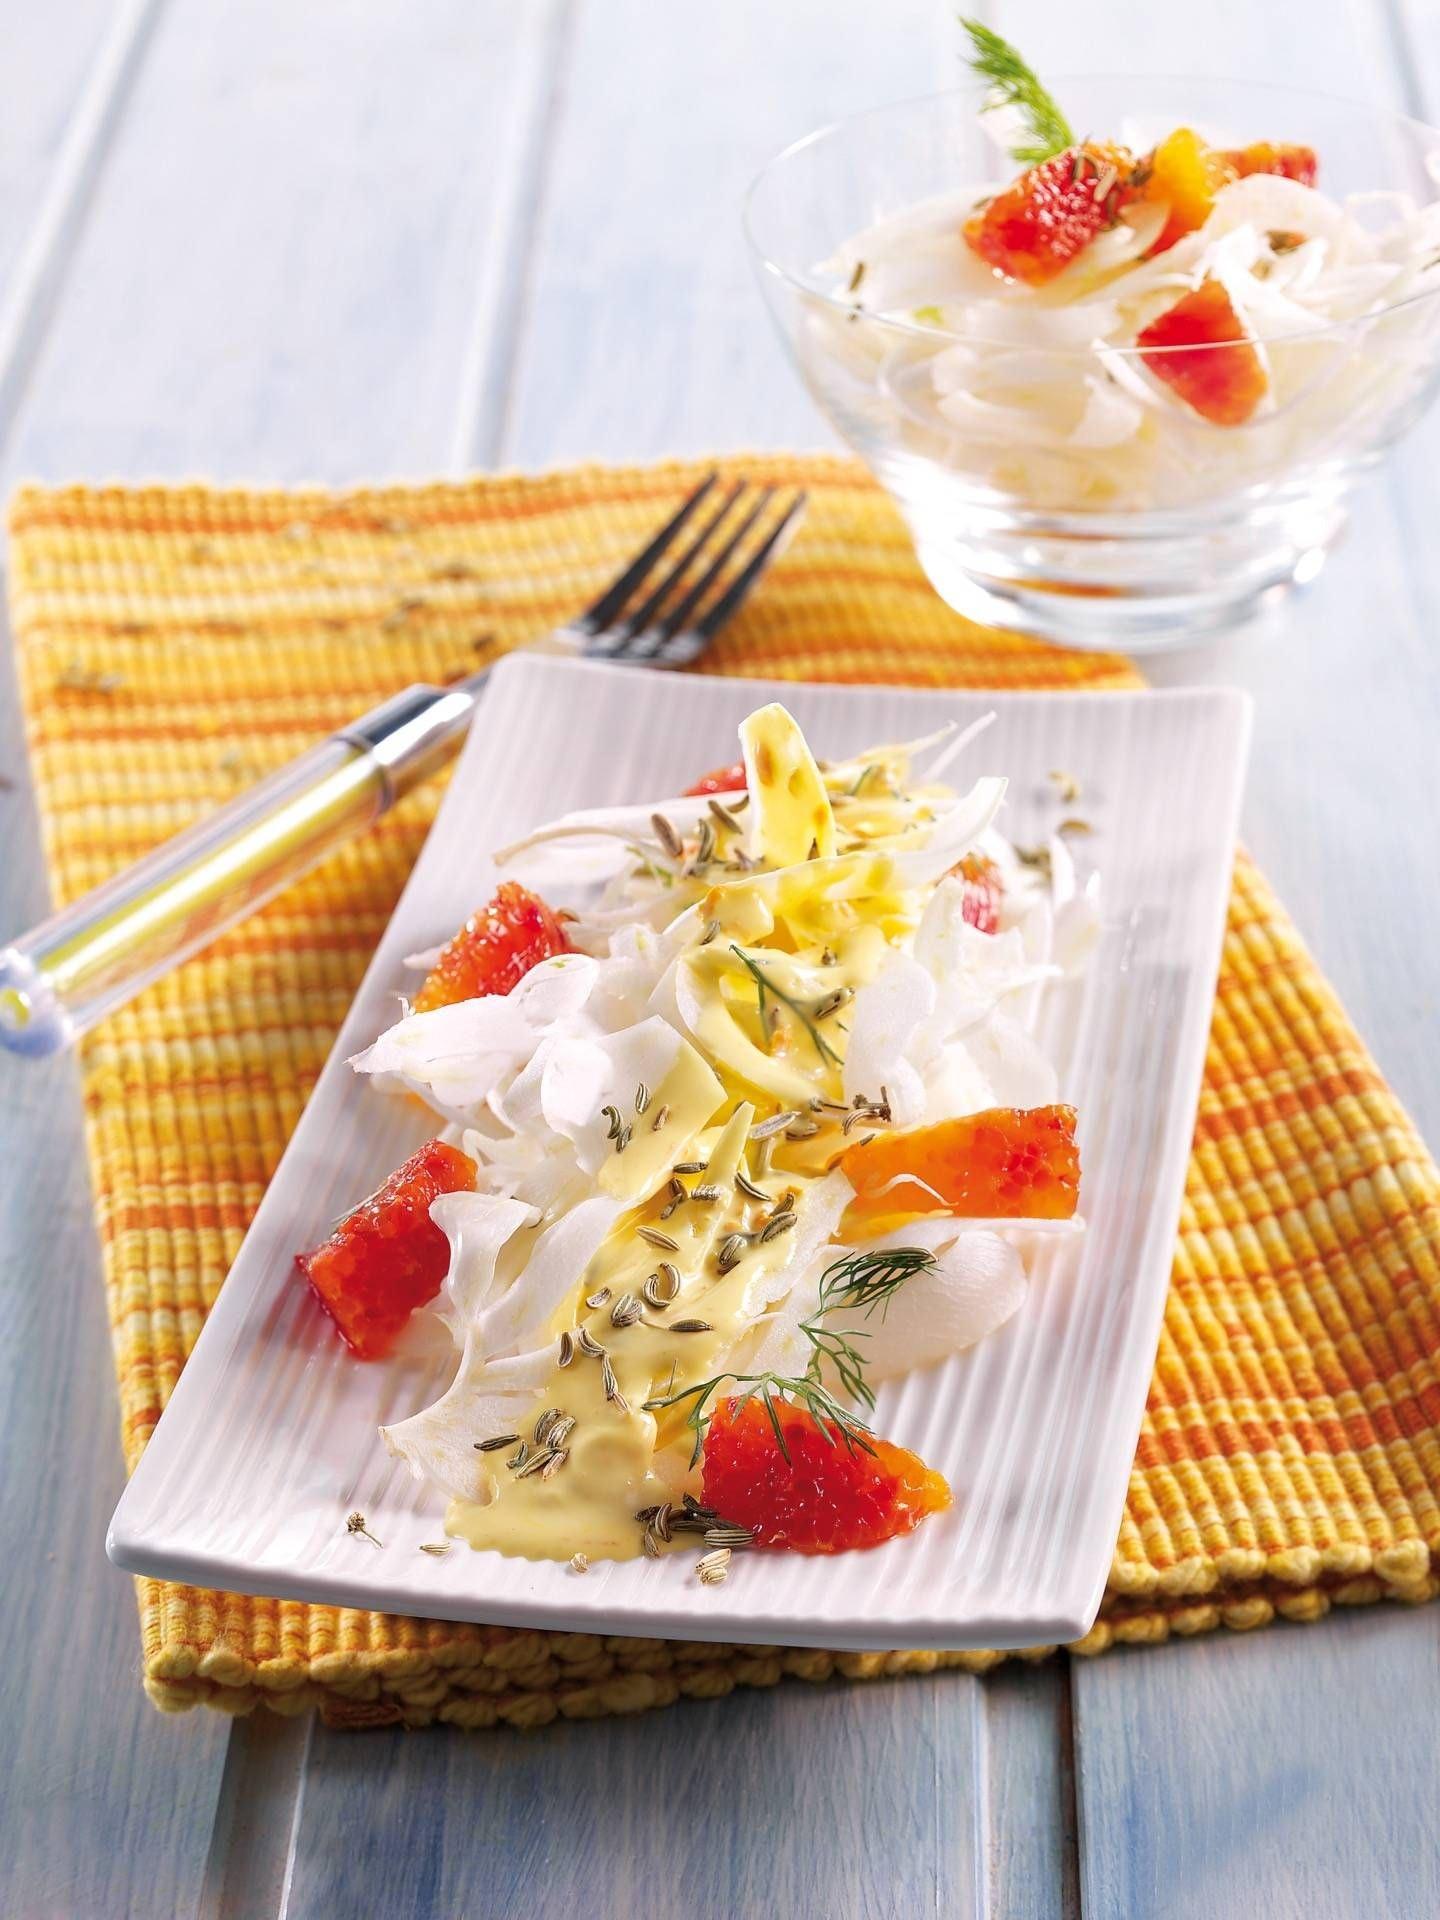 Finocchi a crudo con panna e agrumi - Parmalat